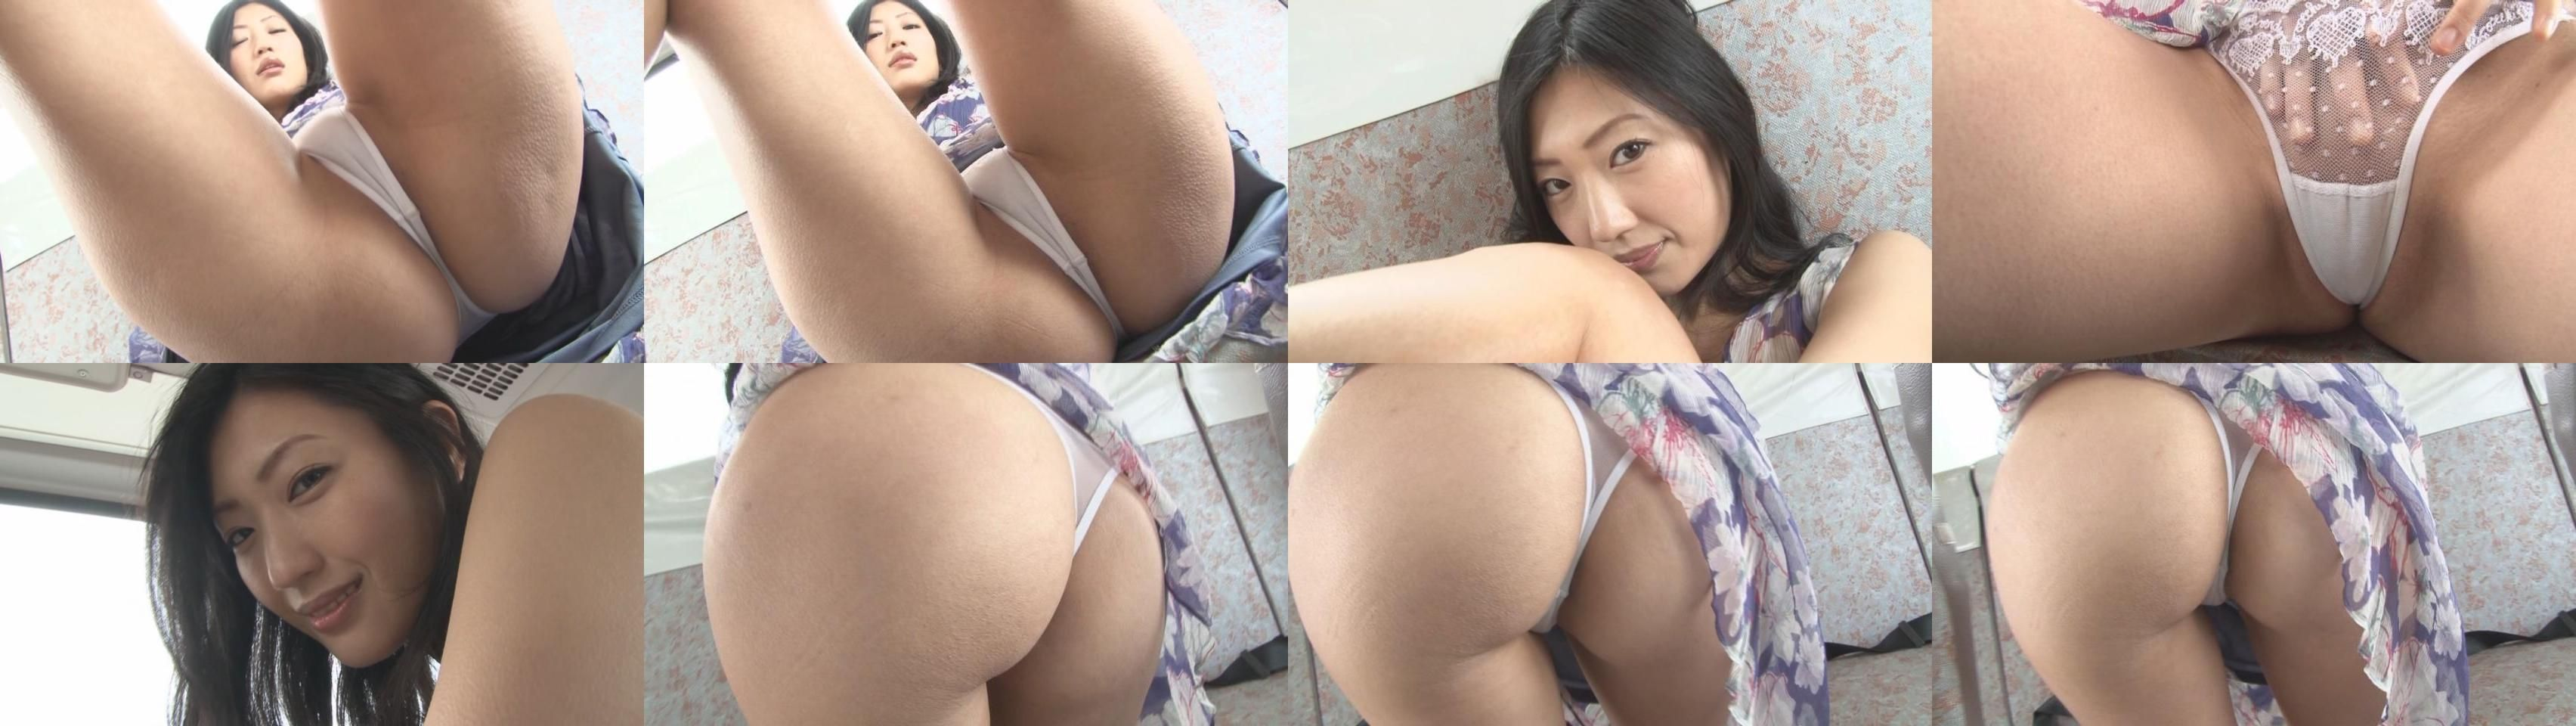 http://livedoor.blogimg.jp/idlekun-cutenadeshiko/imgs/d/e/de95e033.jpg